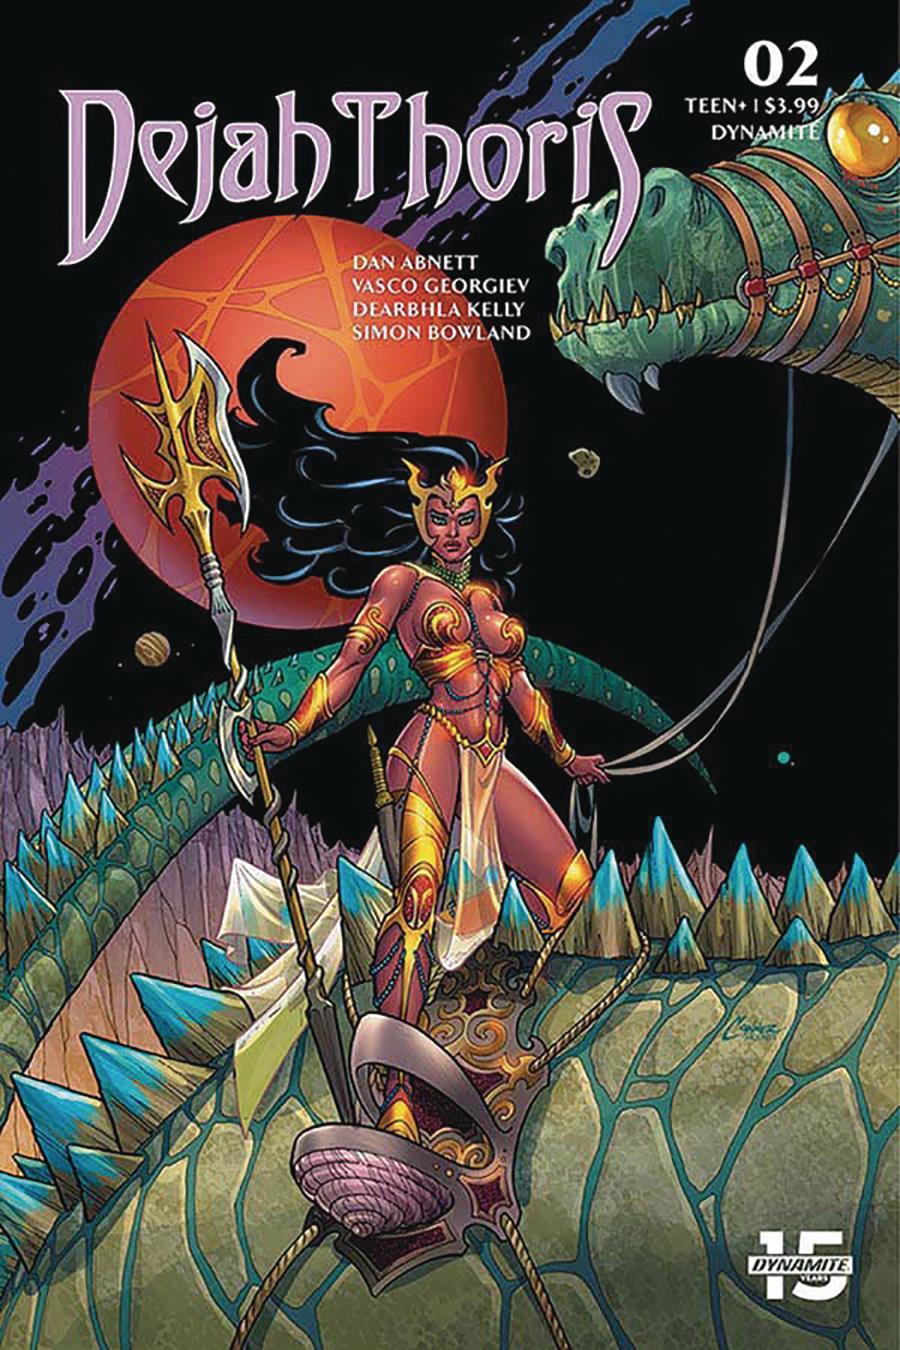 Dejah Thoris Vol 3 #2 Cover B Variant Amanda Conner Cover